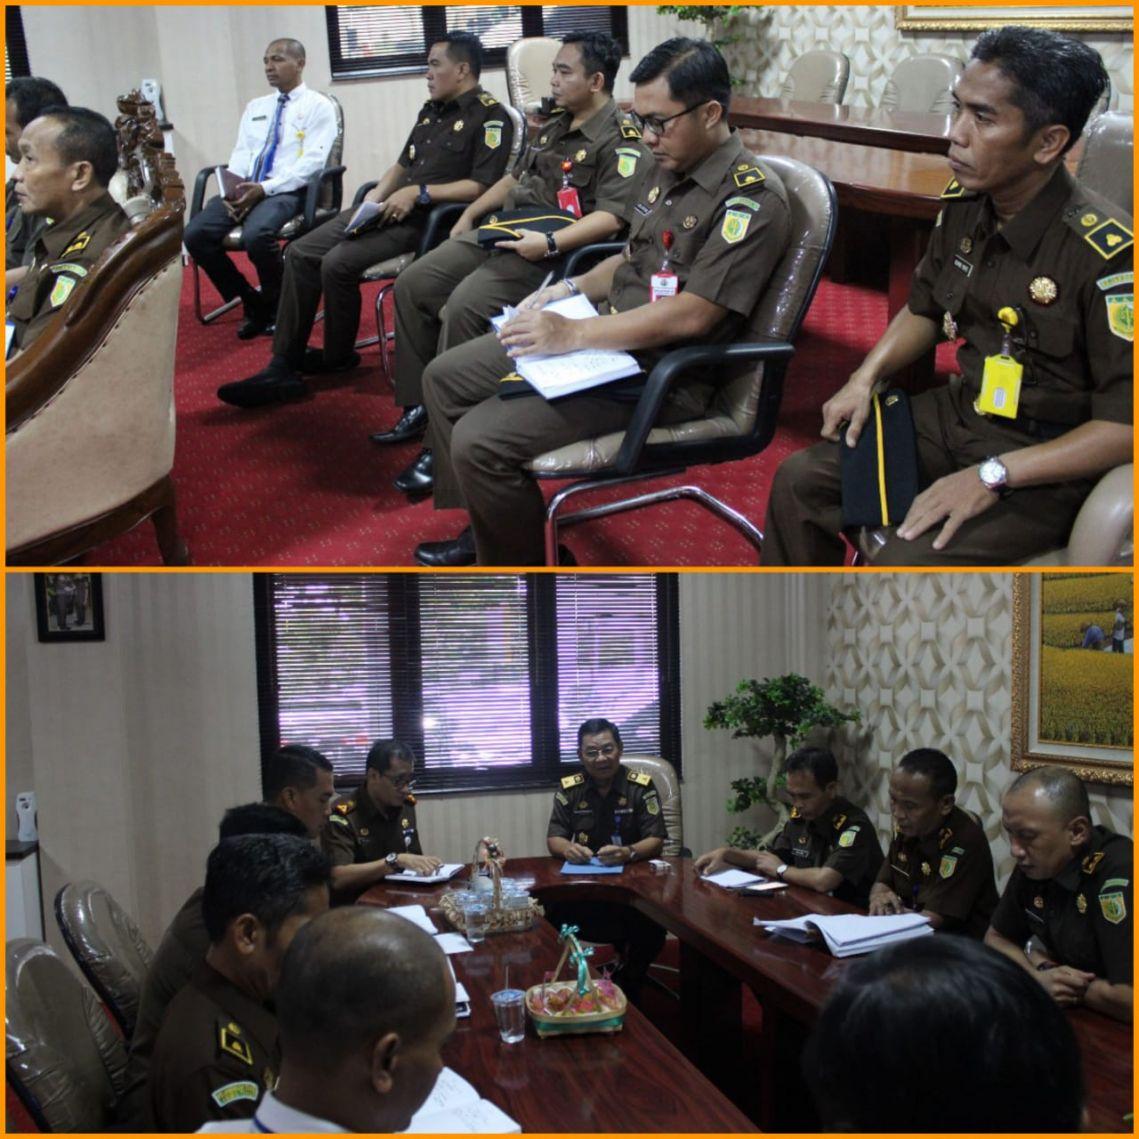 Inspeksi Umun Asisten Pengawasan di Kejaksaan Negeri Surabaya 15-11-2017